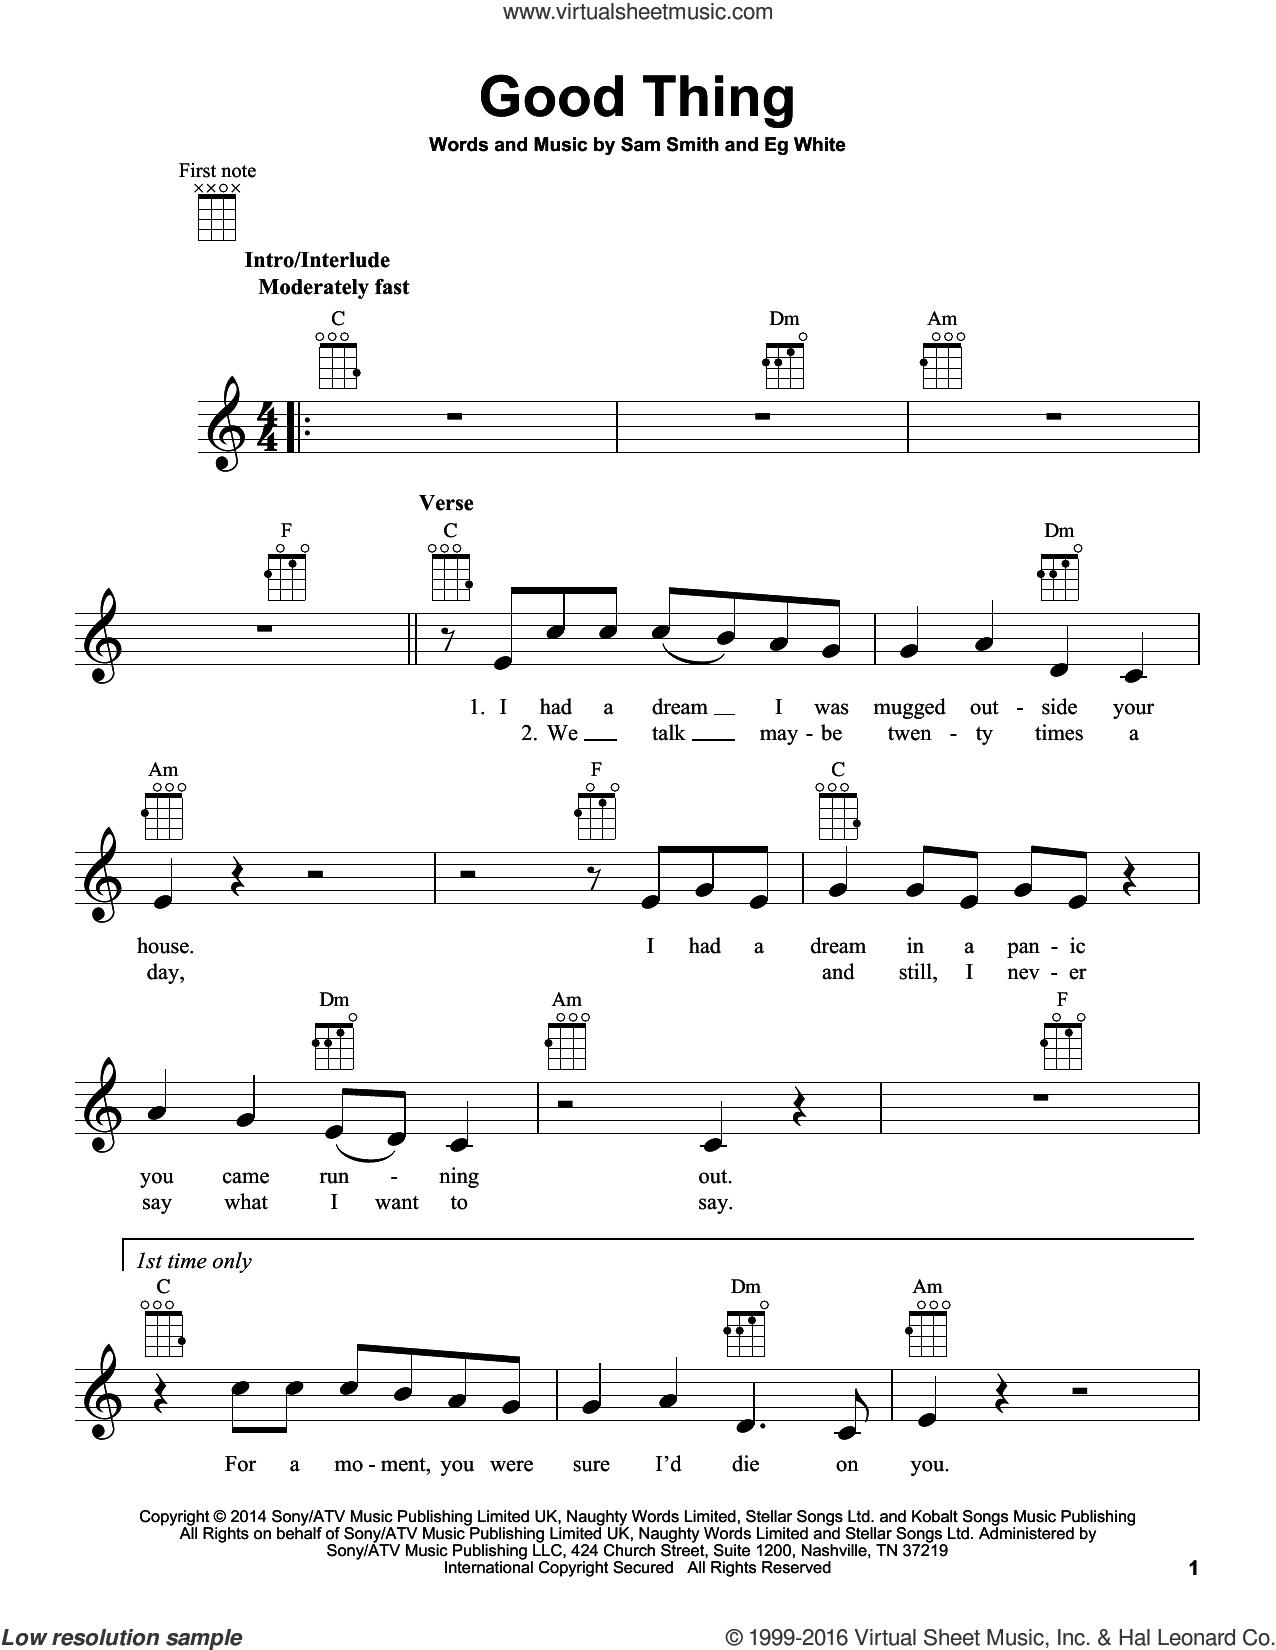 Good Thing sheet music for ukulele by Sam Smith and Eg White, intermediate skill level